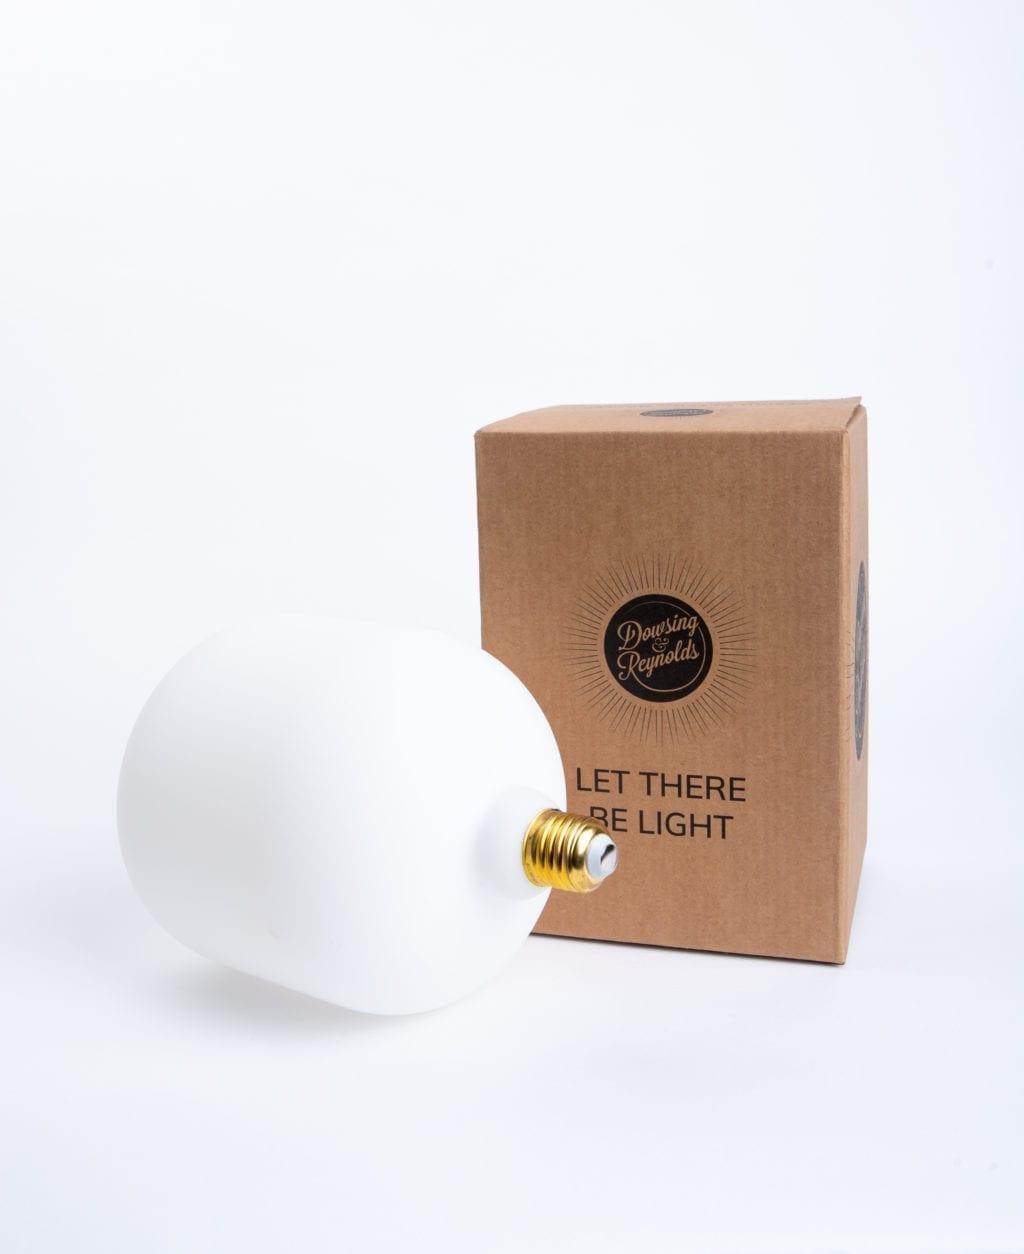 Pandora globe light bulb with cardboard box against white background